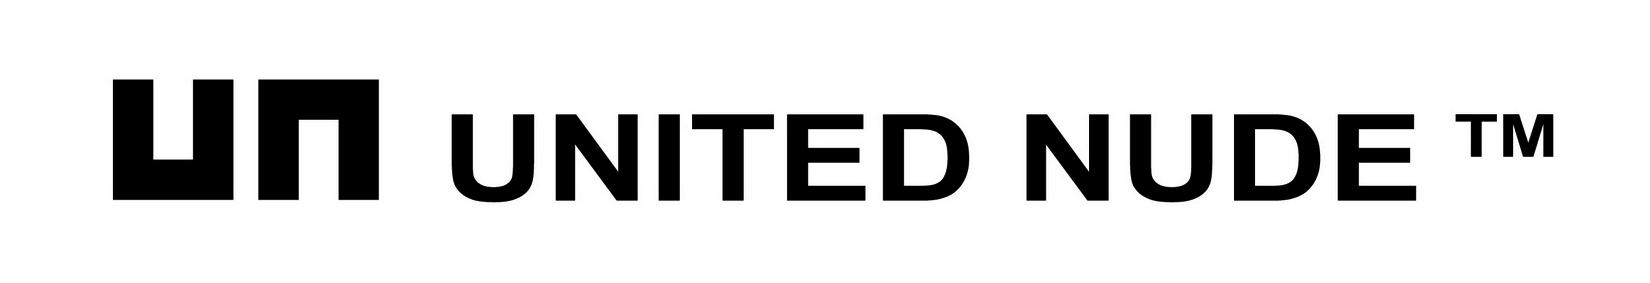 United Nude logo logotype (UN)